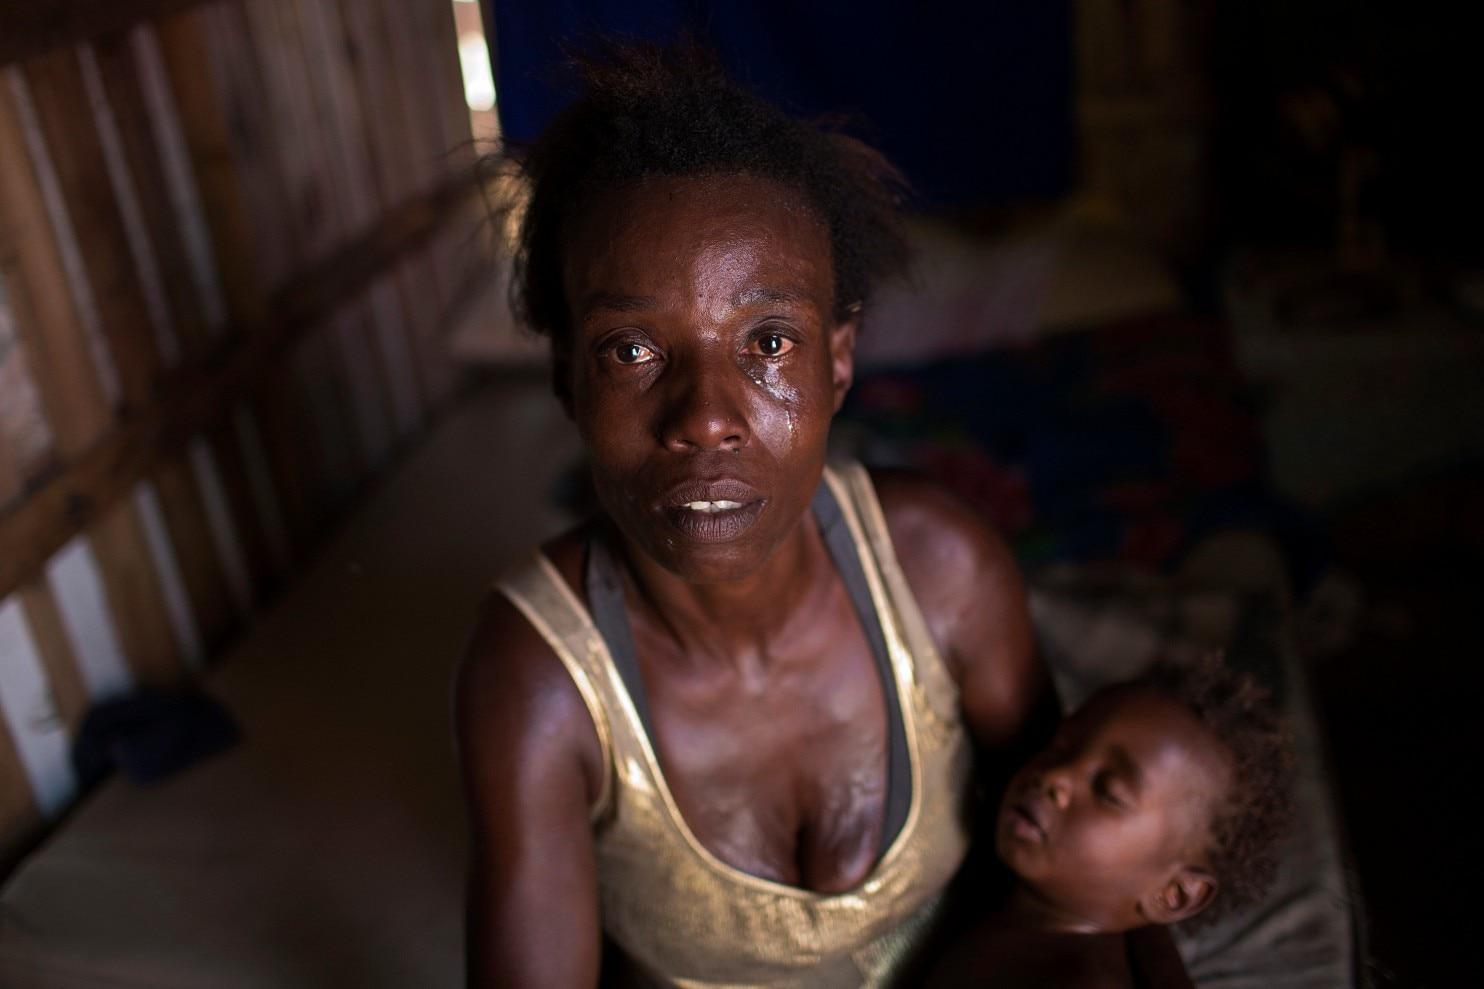 https://img.washingtonpost.com/rf/image_1484w/2010-2019/Wires/Online/2017-10-23/AP/Images/APTOPIX_Brazil_Returning_to_Poverty_09783.jpg-1bc38.jpg?uuid=TcW5pLenEeebk7lwQ-V6Ig